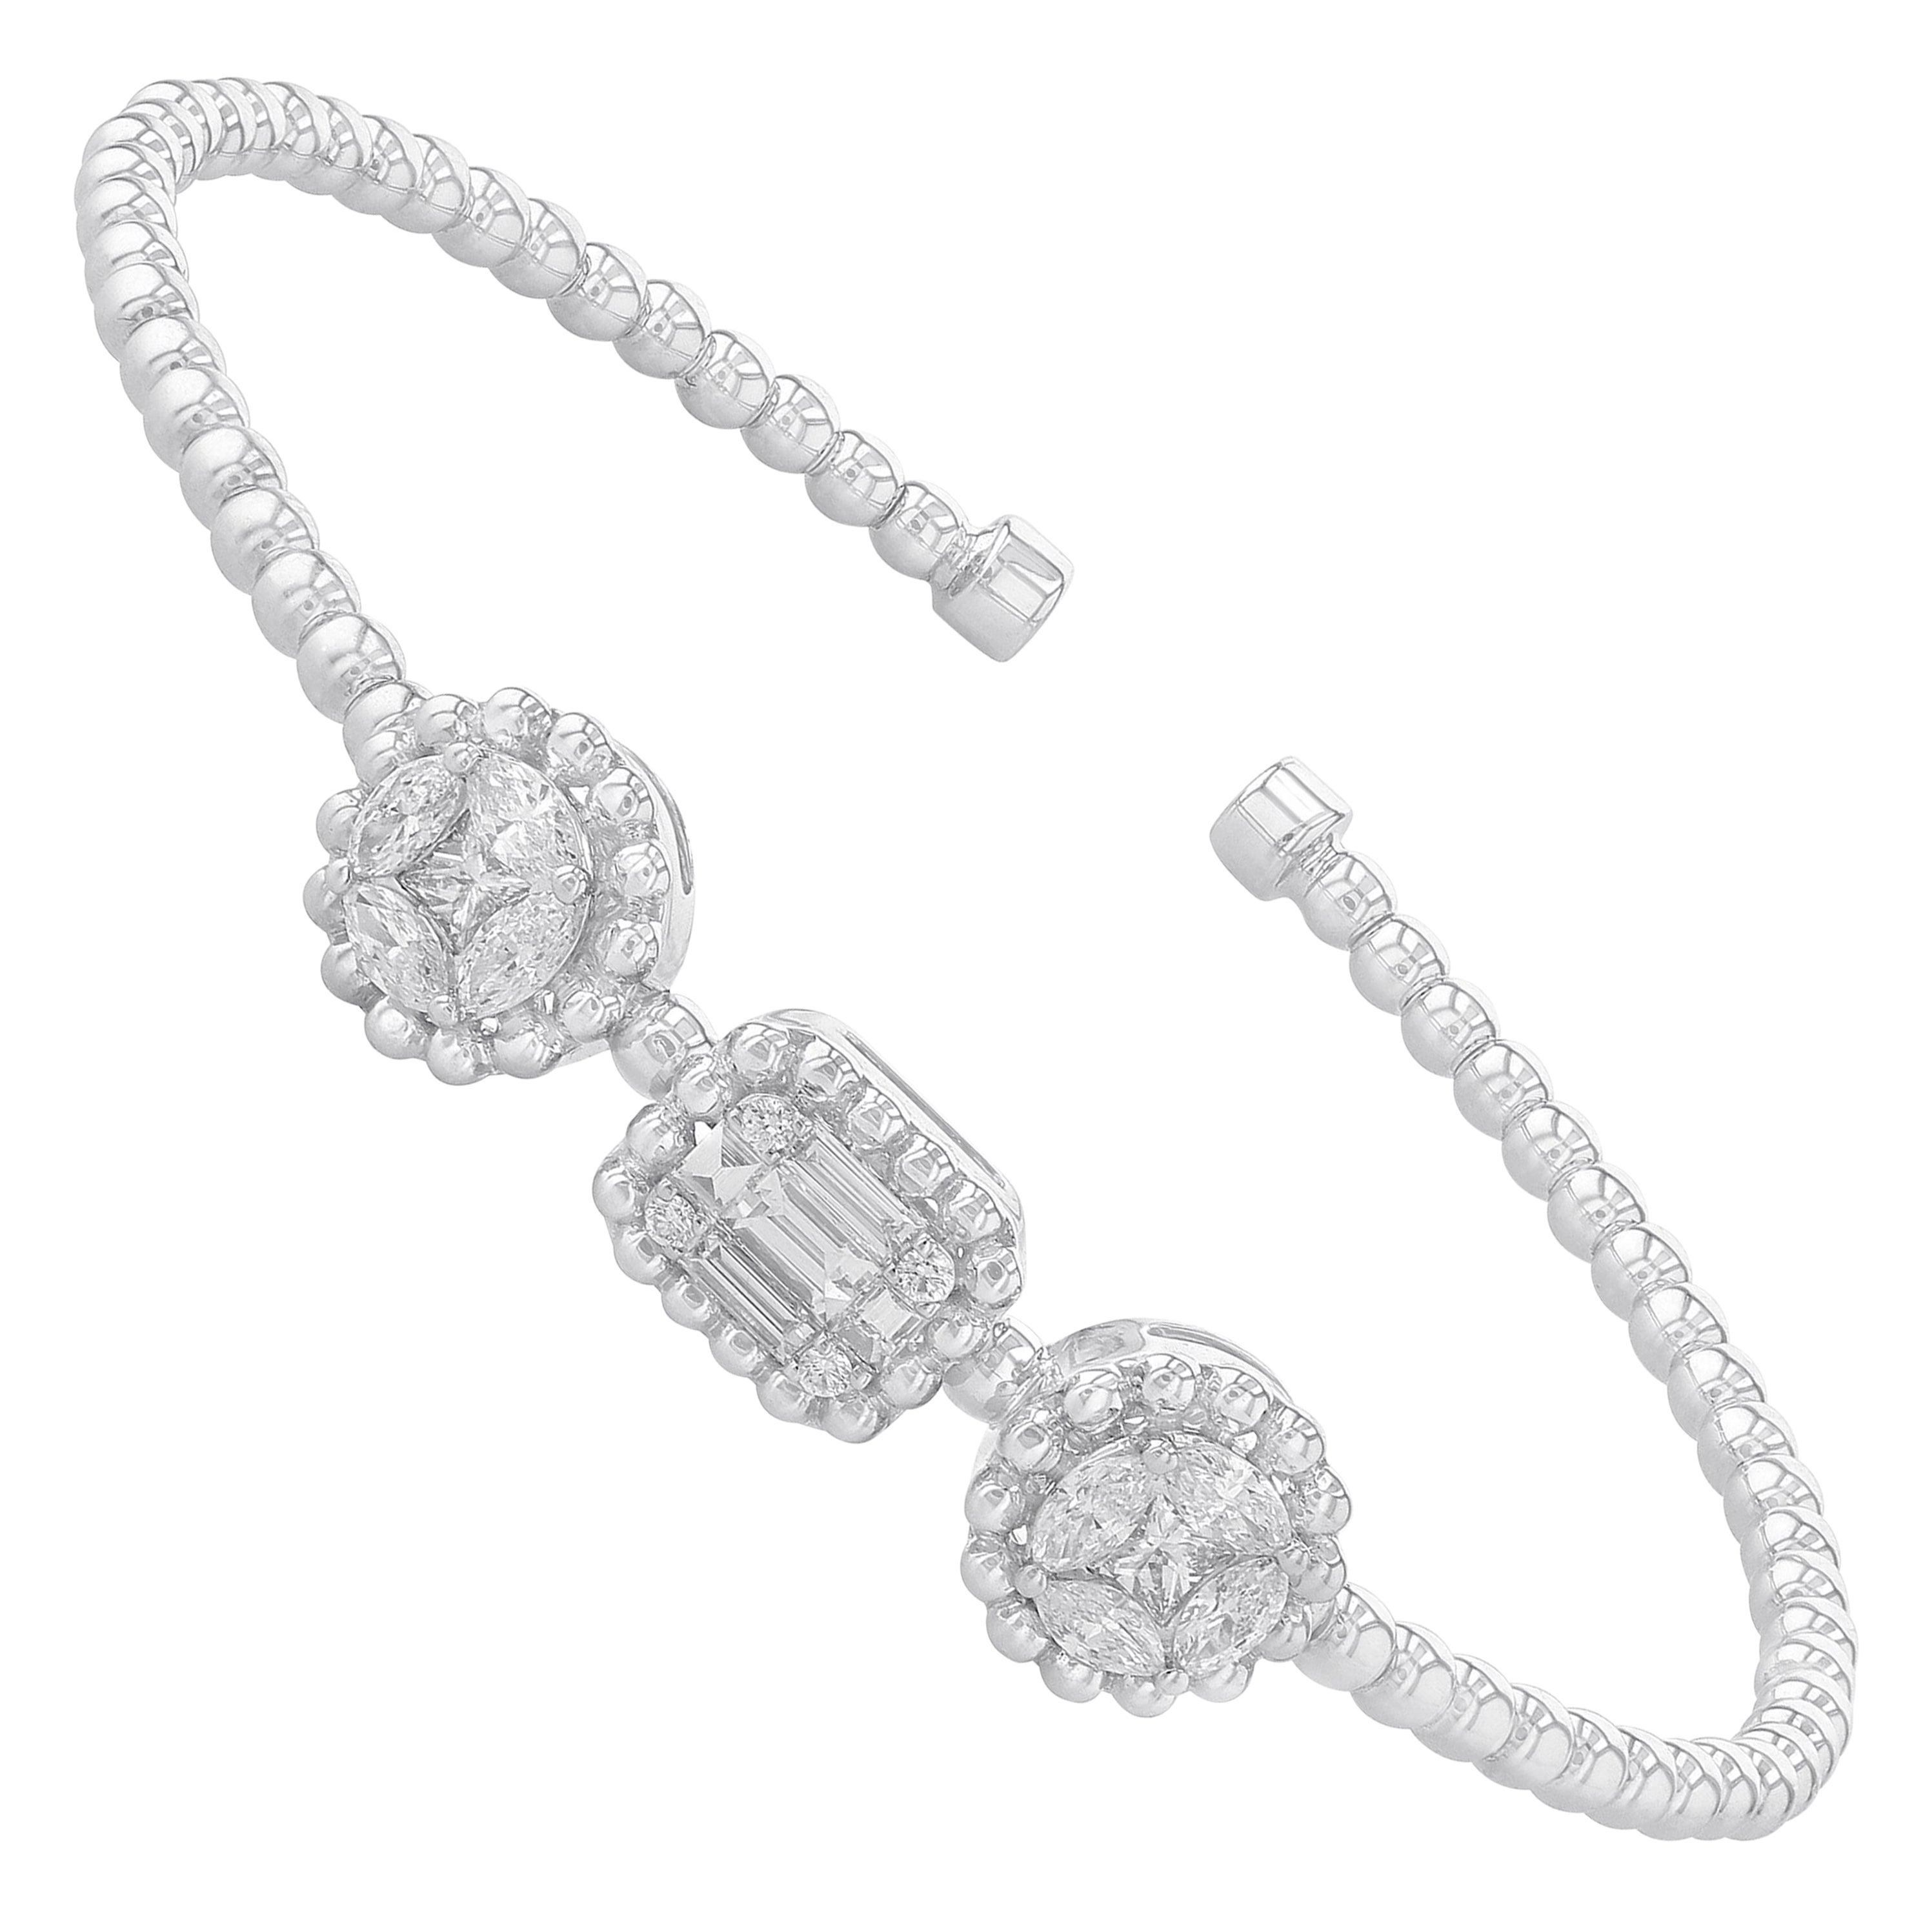 Amwaj Jewelry Baguette and Round Cut Diamond Bracelet